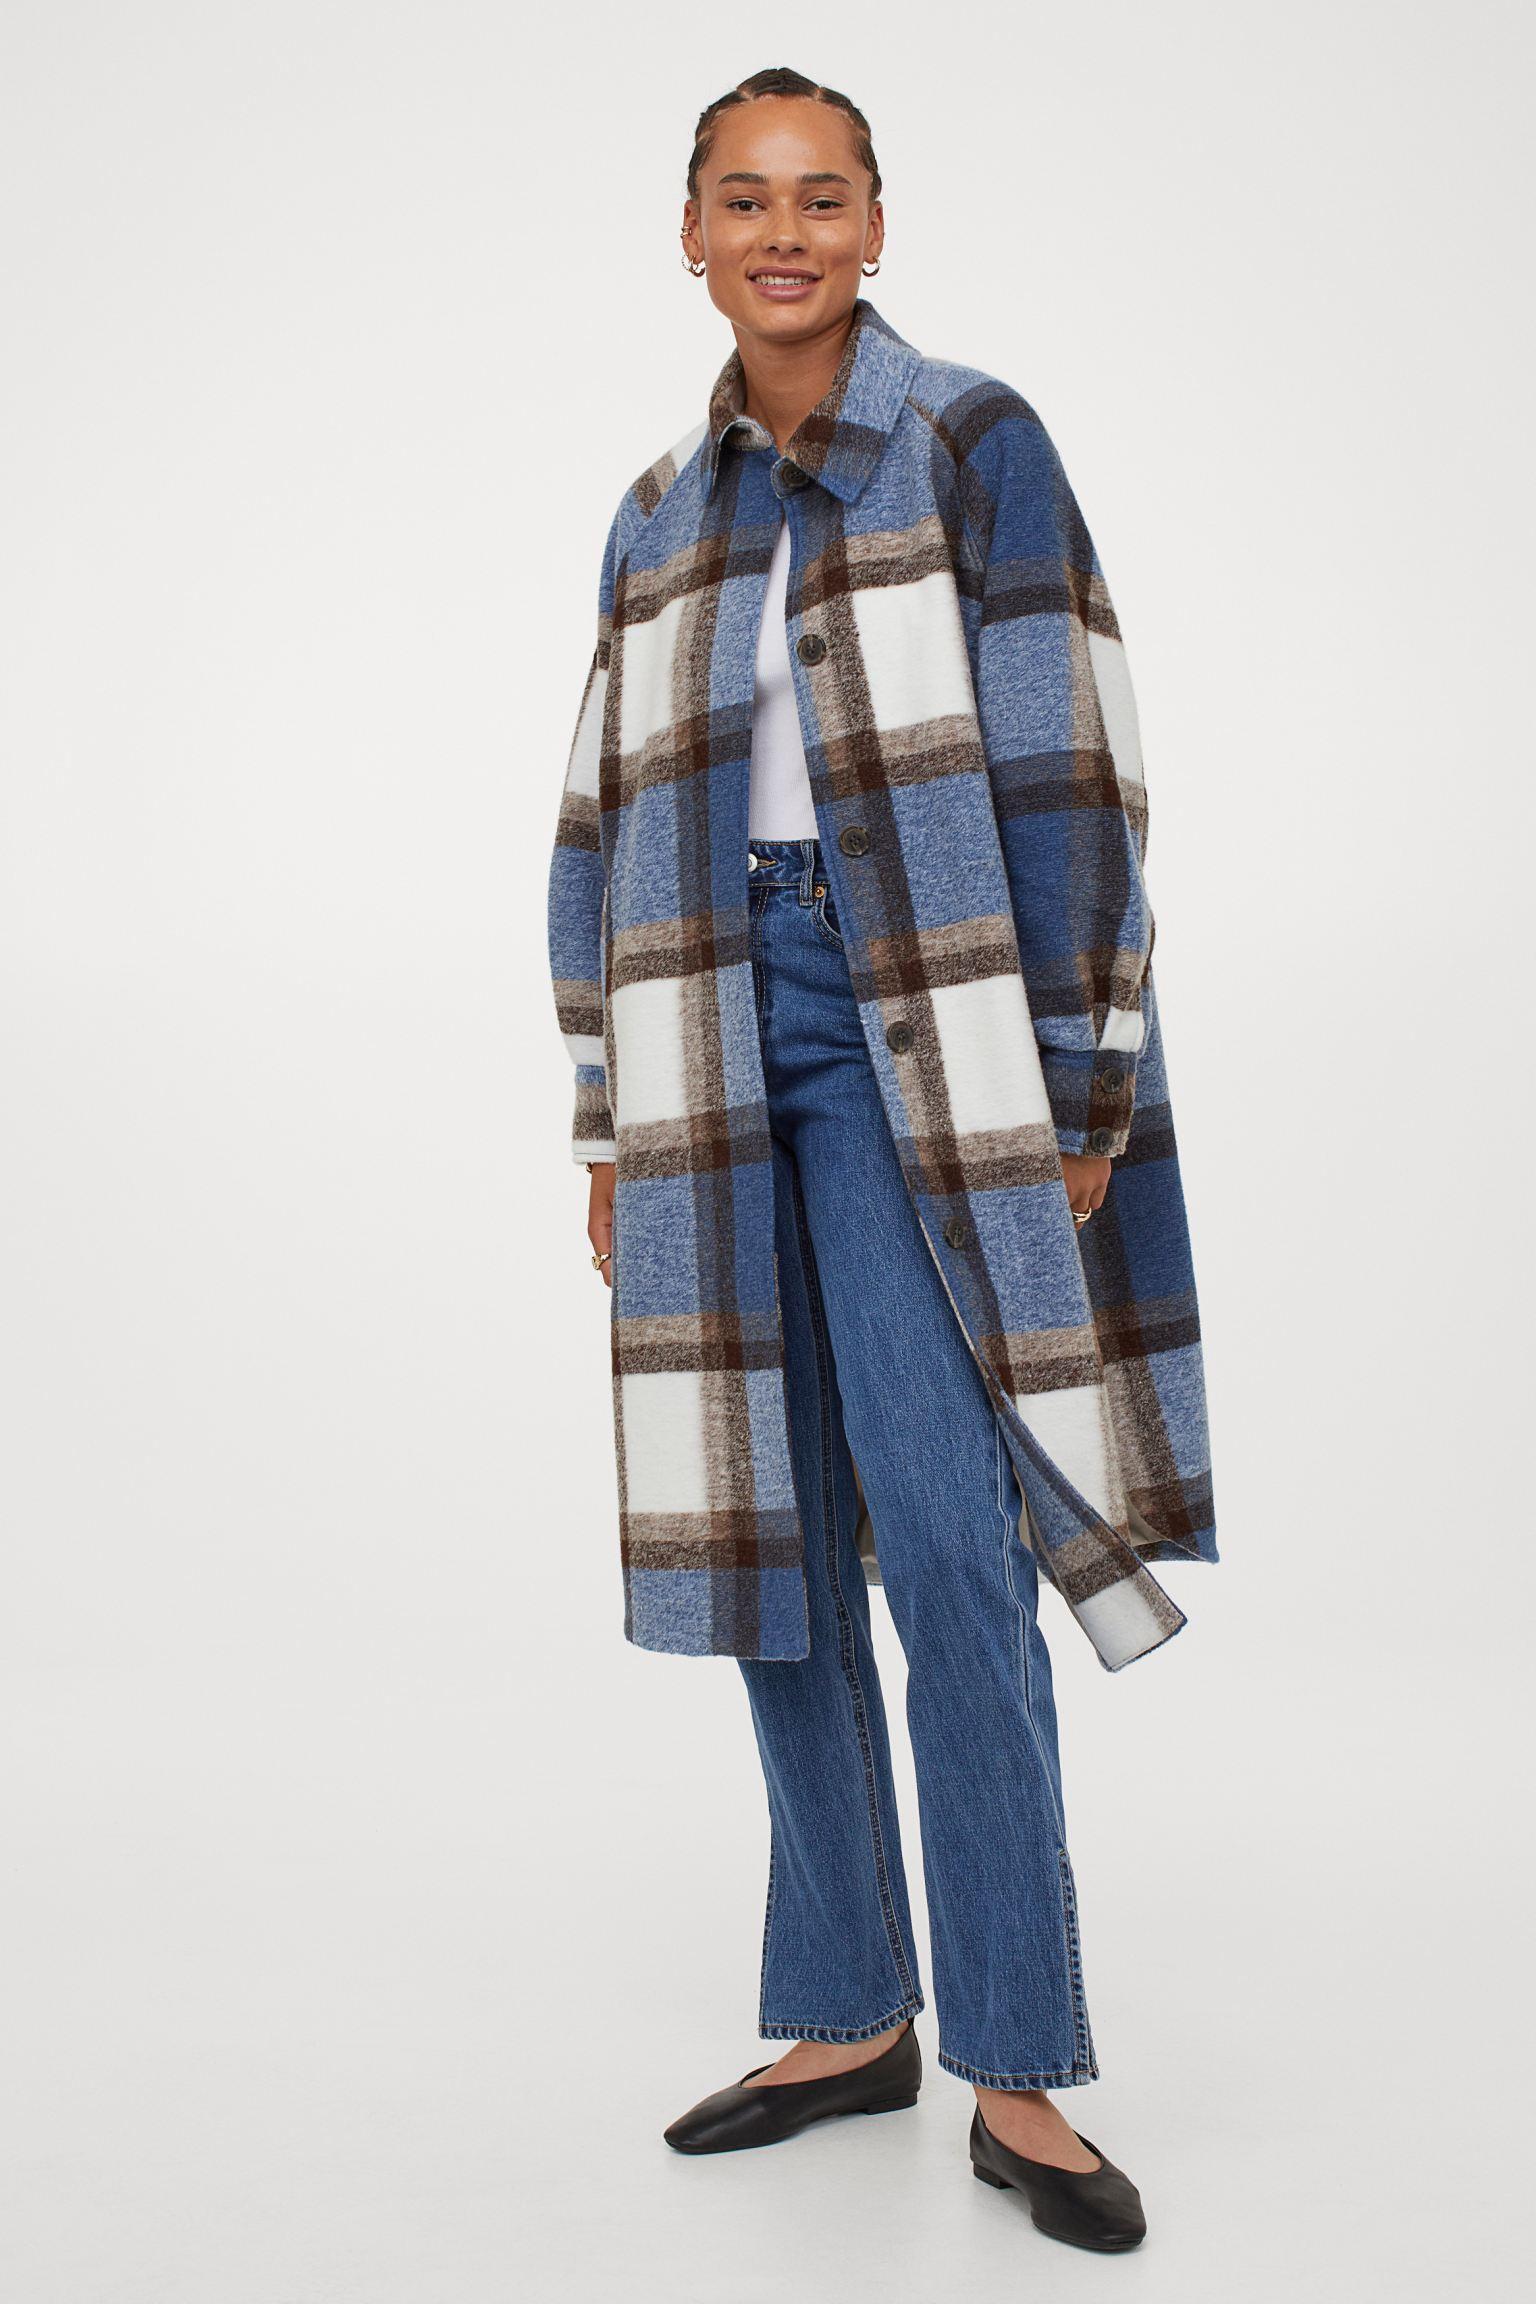 Abrigo oversize con lana en la trama.